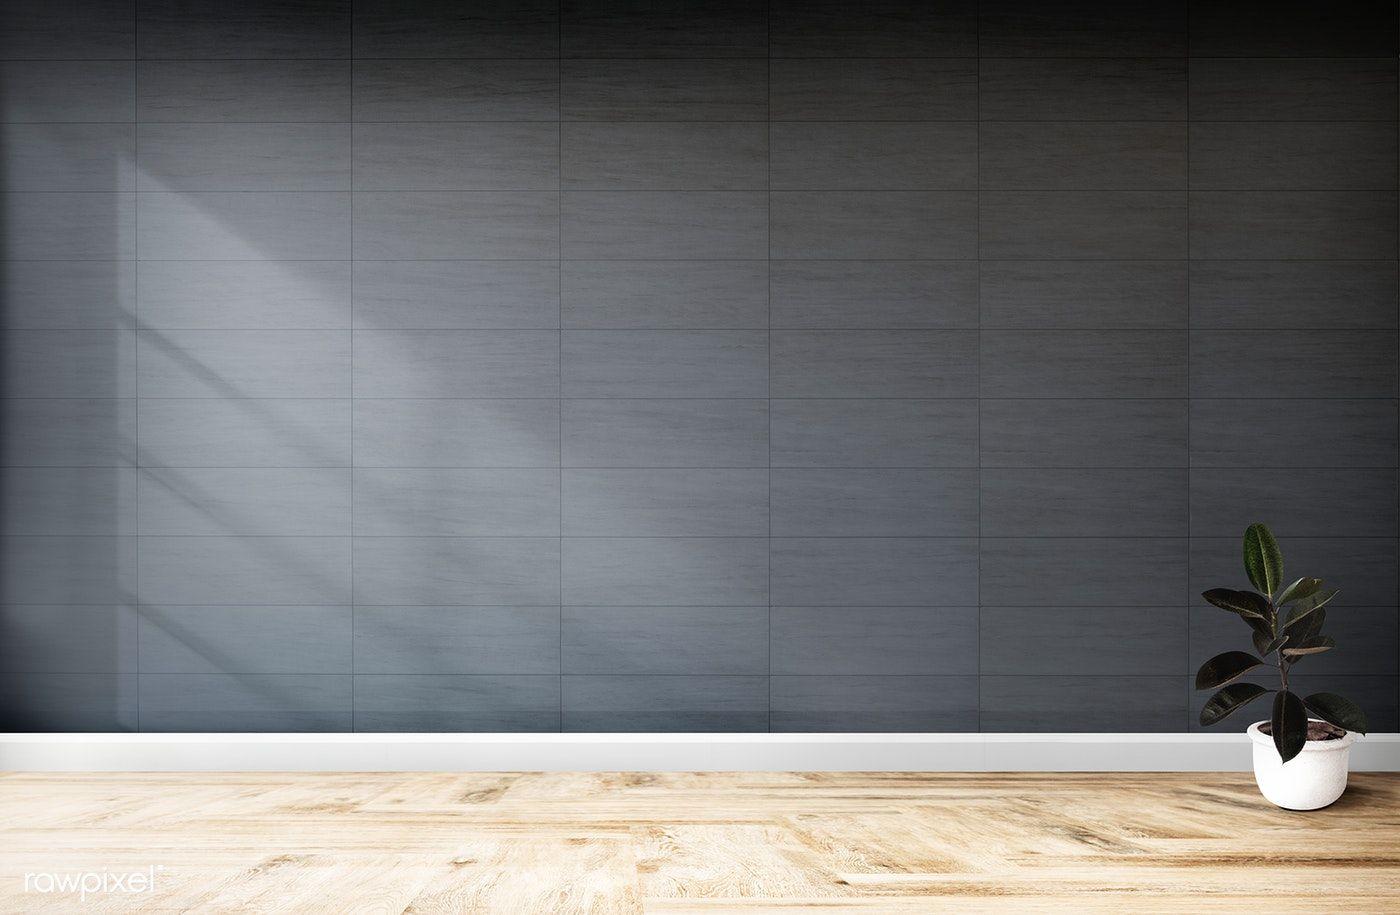 Plant Against A Black Wall Mockup Free Image By Rawpixel Com Black Walls Room Wallpaper Wall